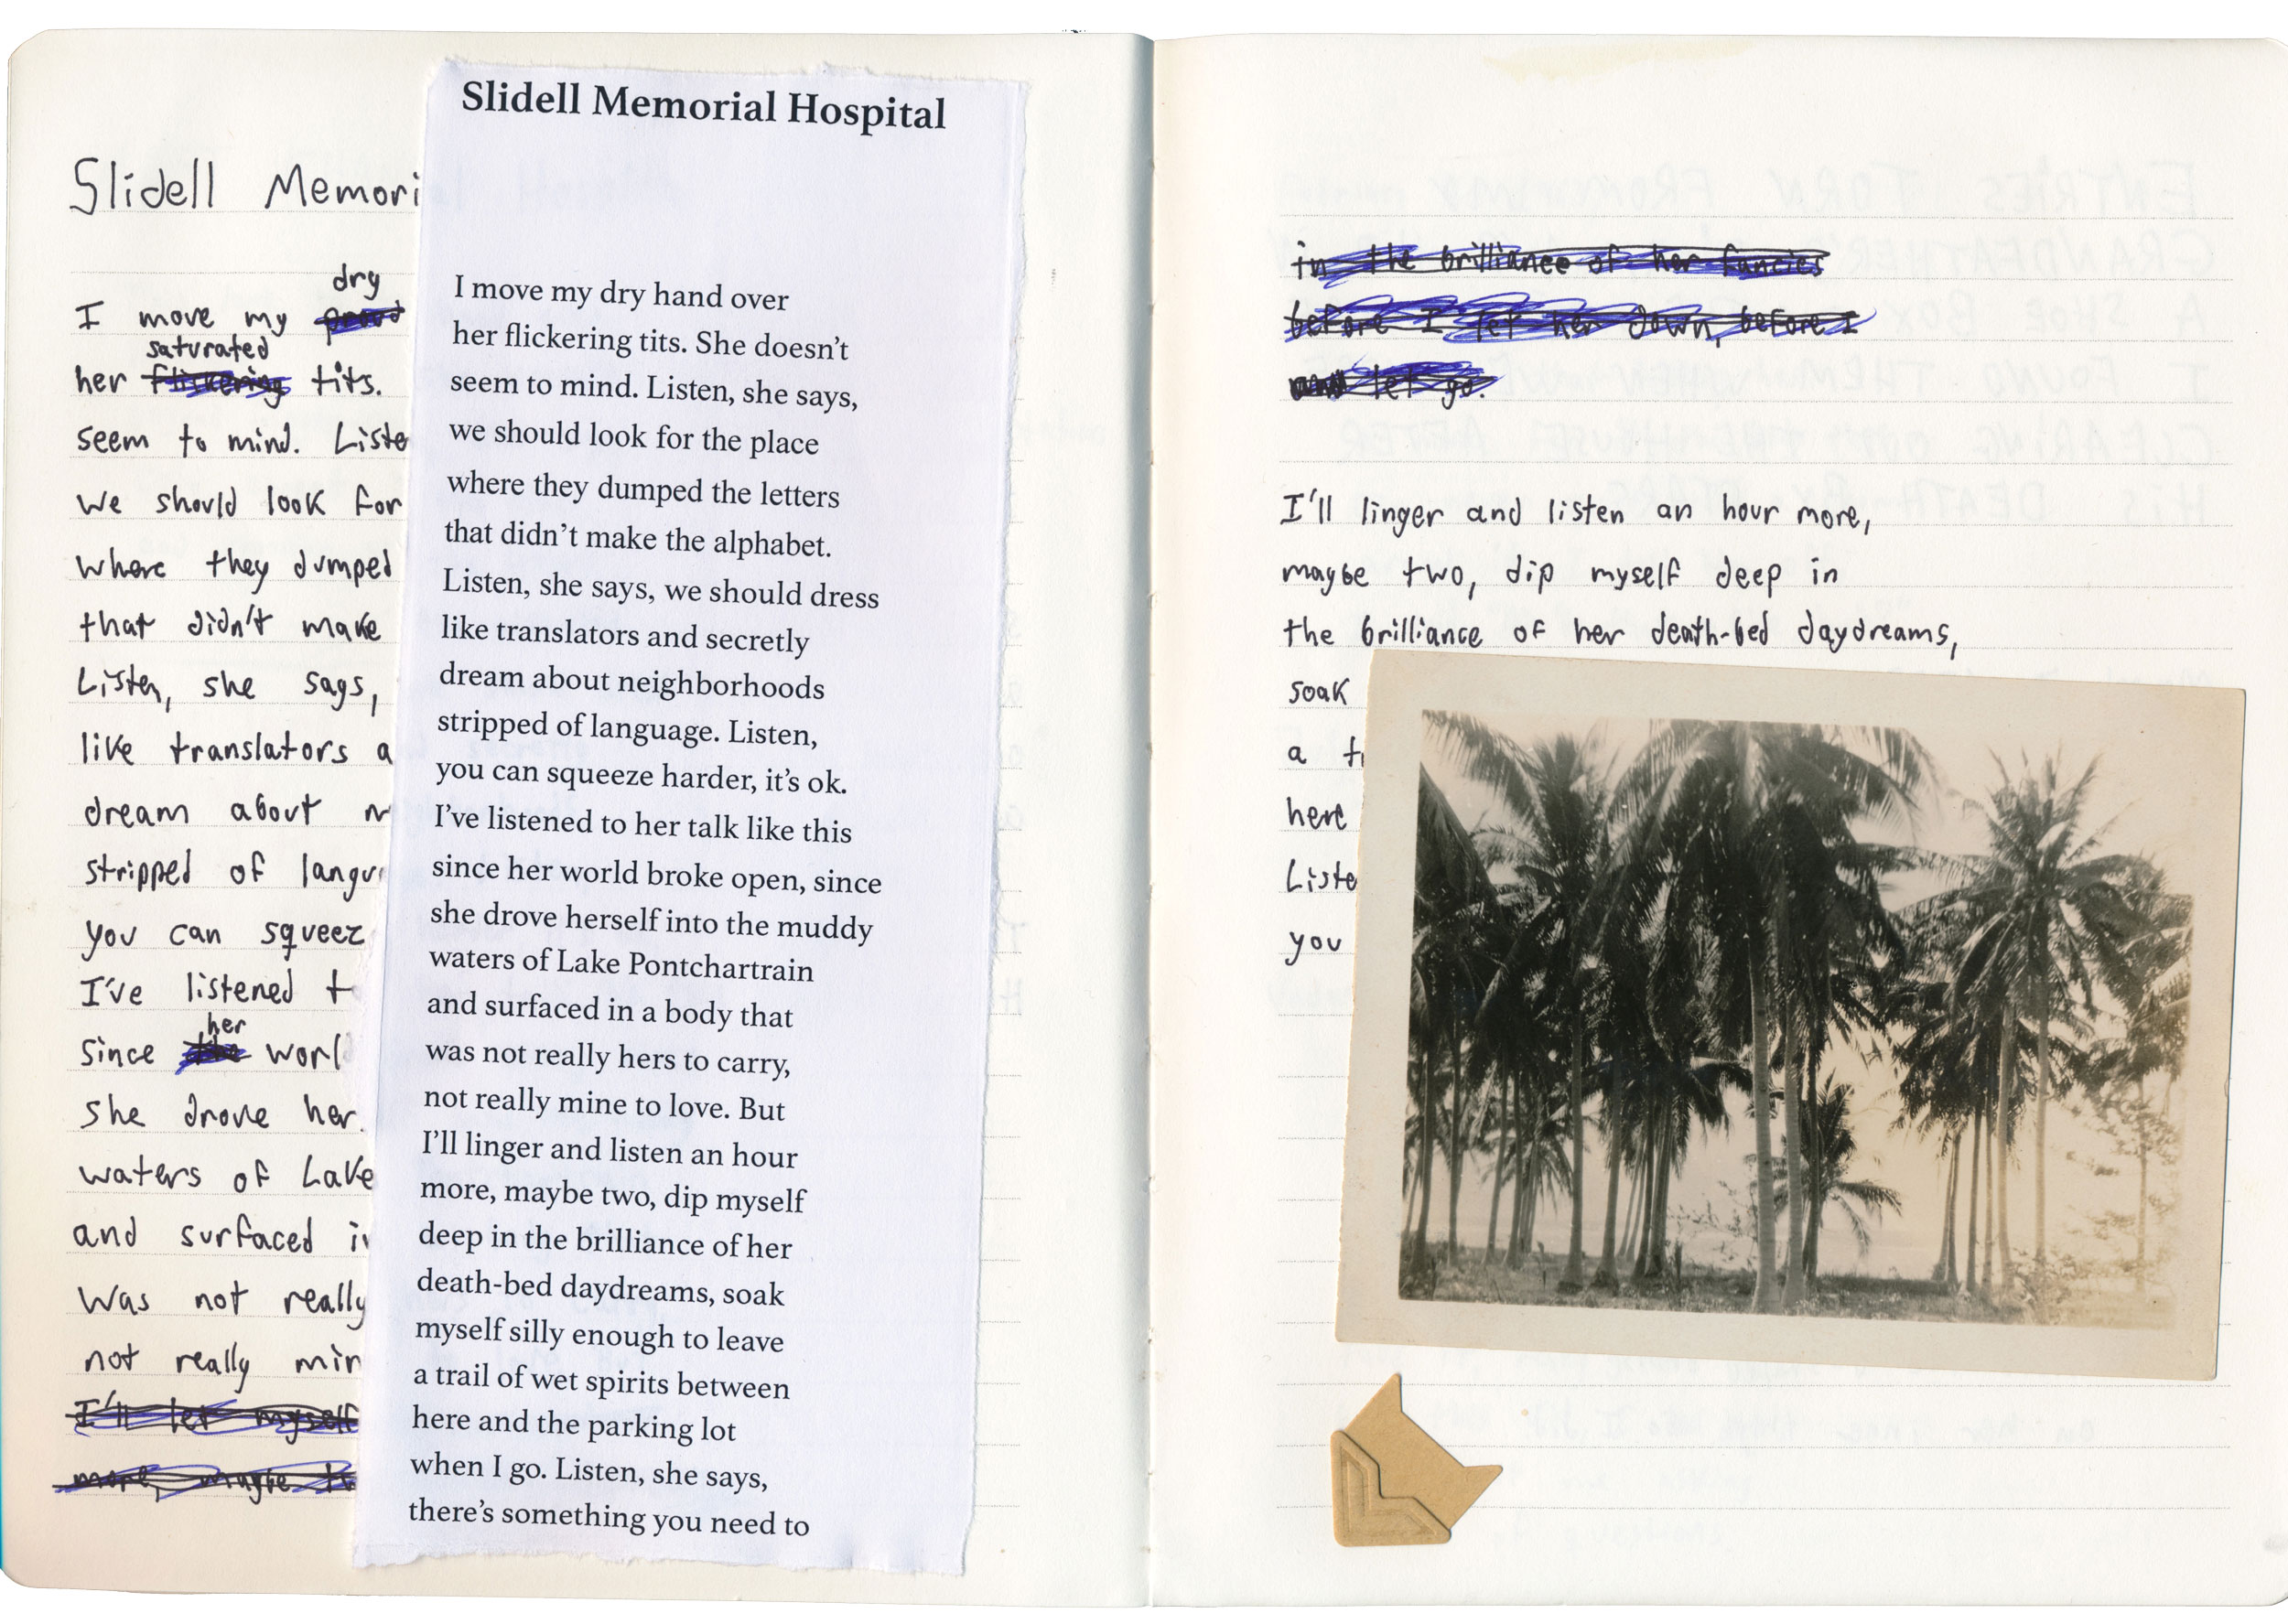 Archive of our collapse 6 - Slidell Memorial Hospital.jpg